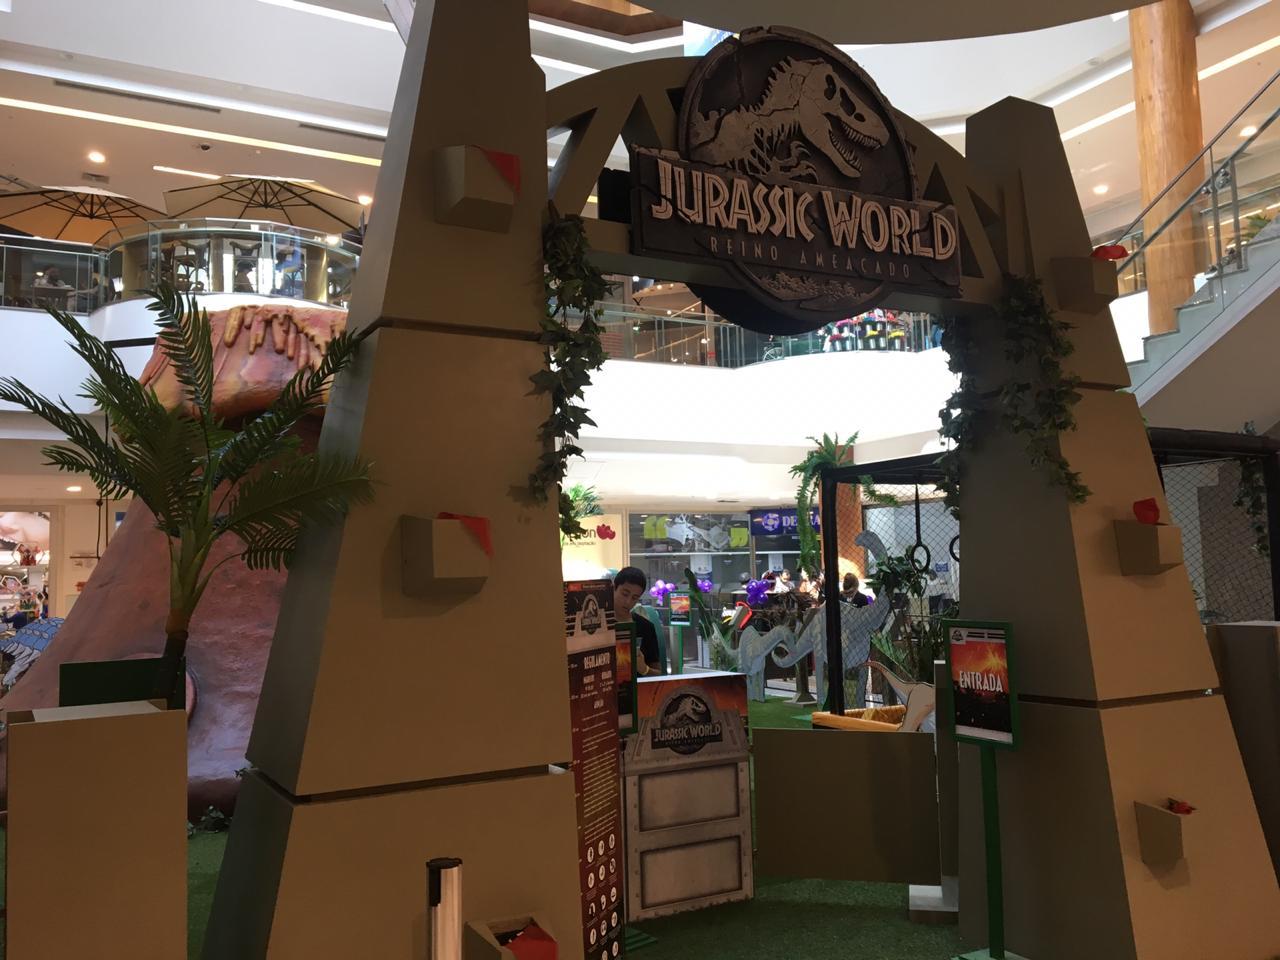 Parque do Jurassic World chega ao Natal Shopping